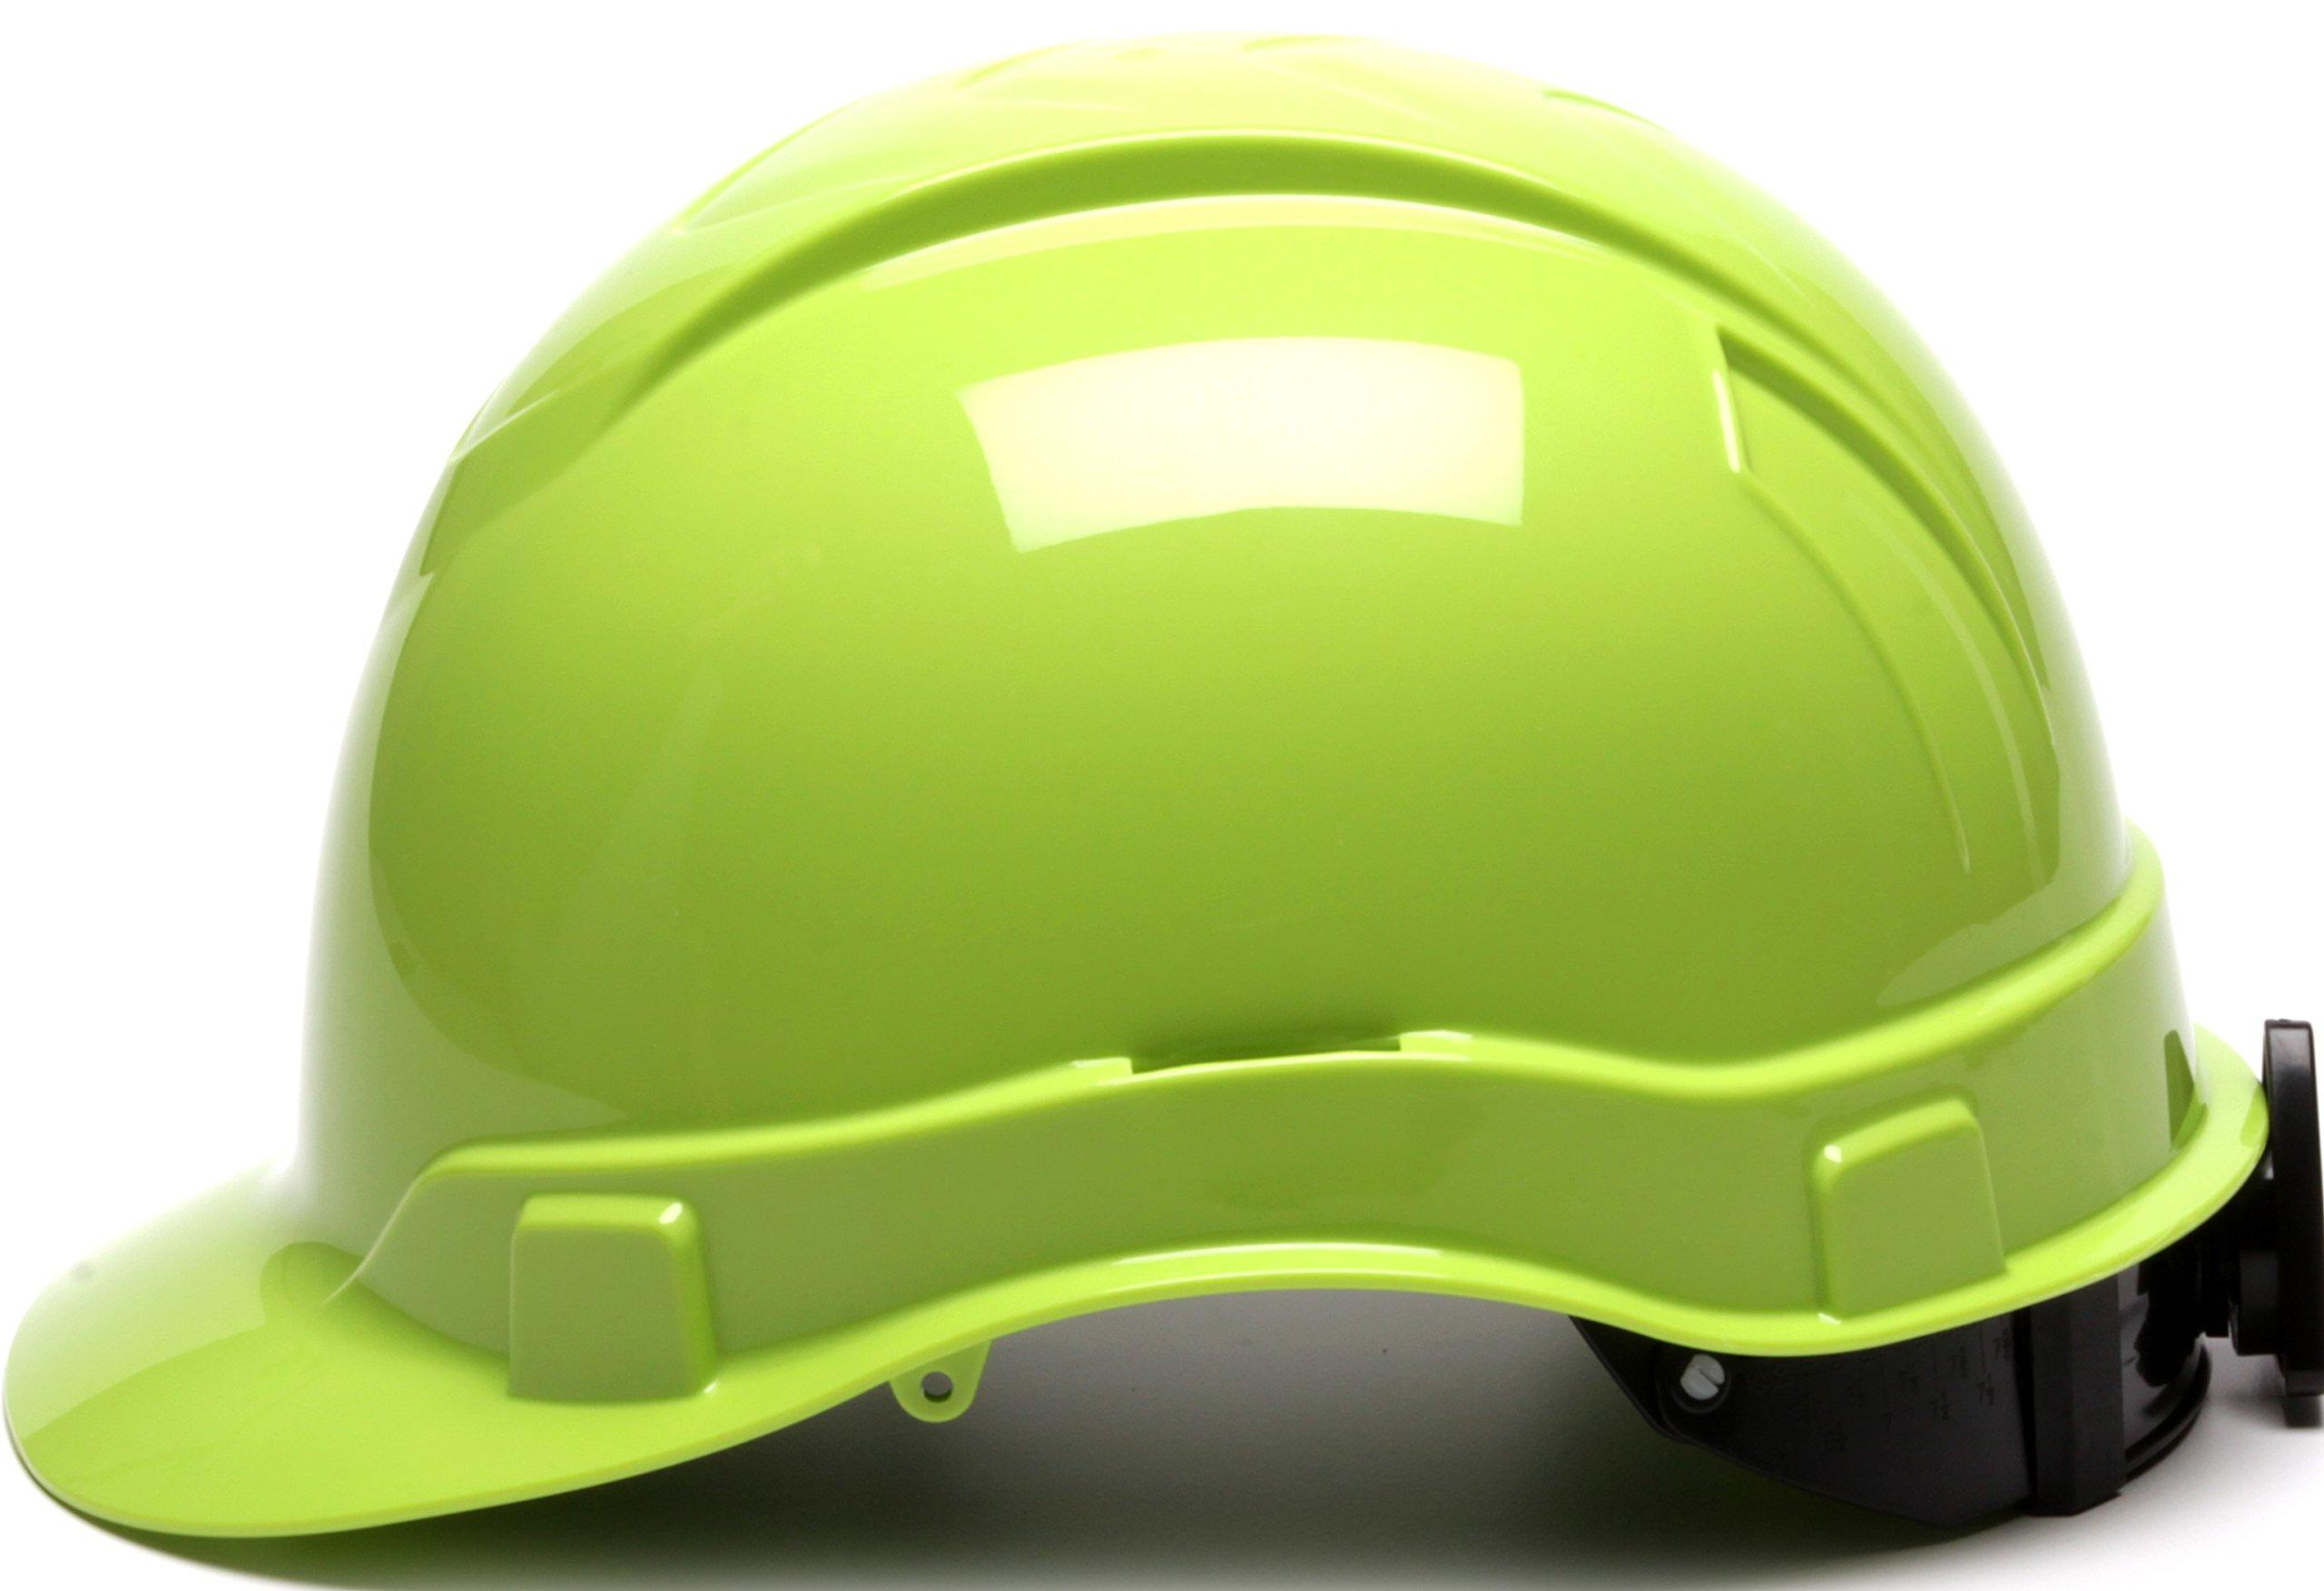 Pyramex Ridgeline Cap Style Hard Hat, 6 Point Ratchet Suspension, Hi Vis Lime by Pyramex Safety (Image #3)